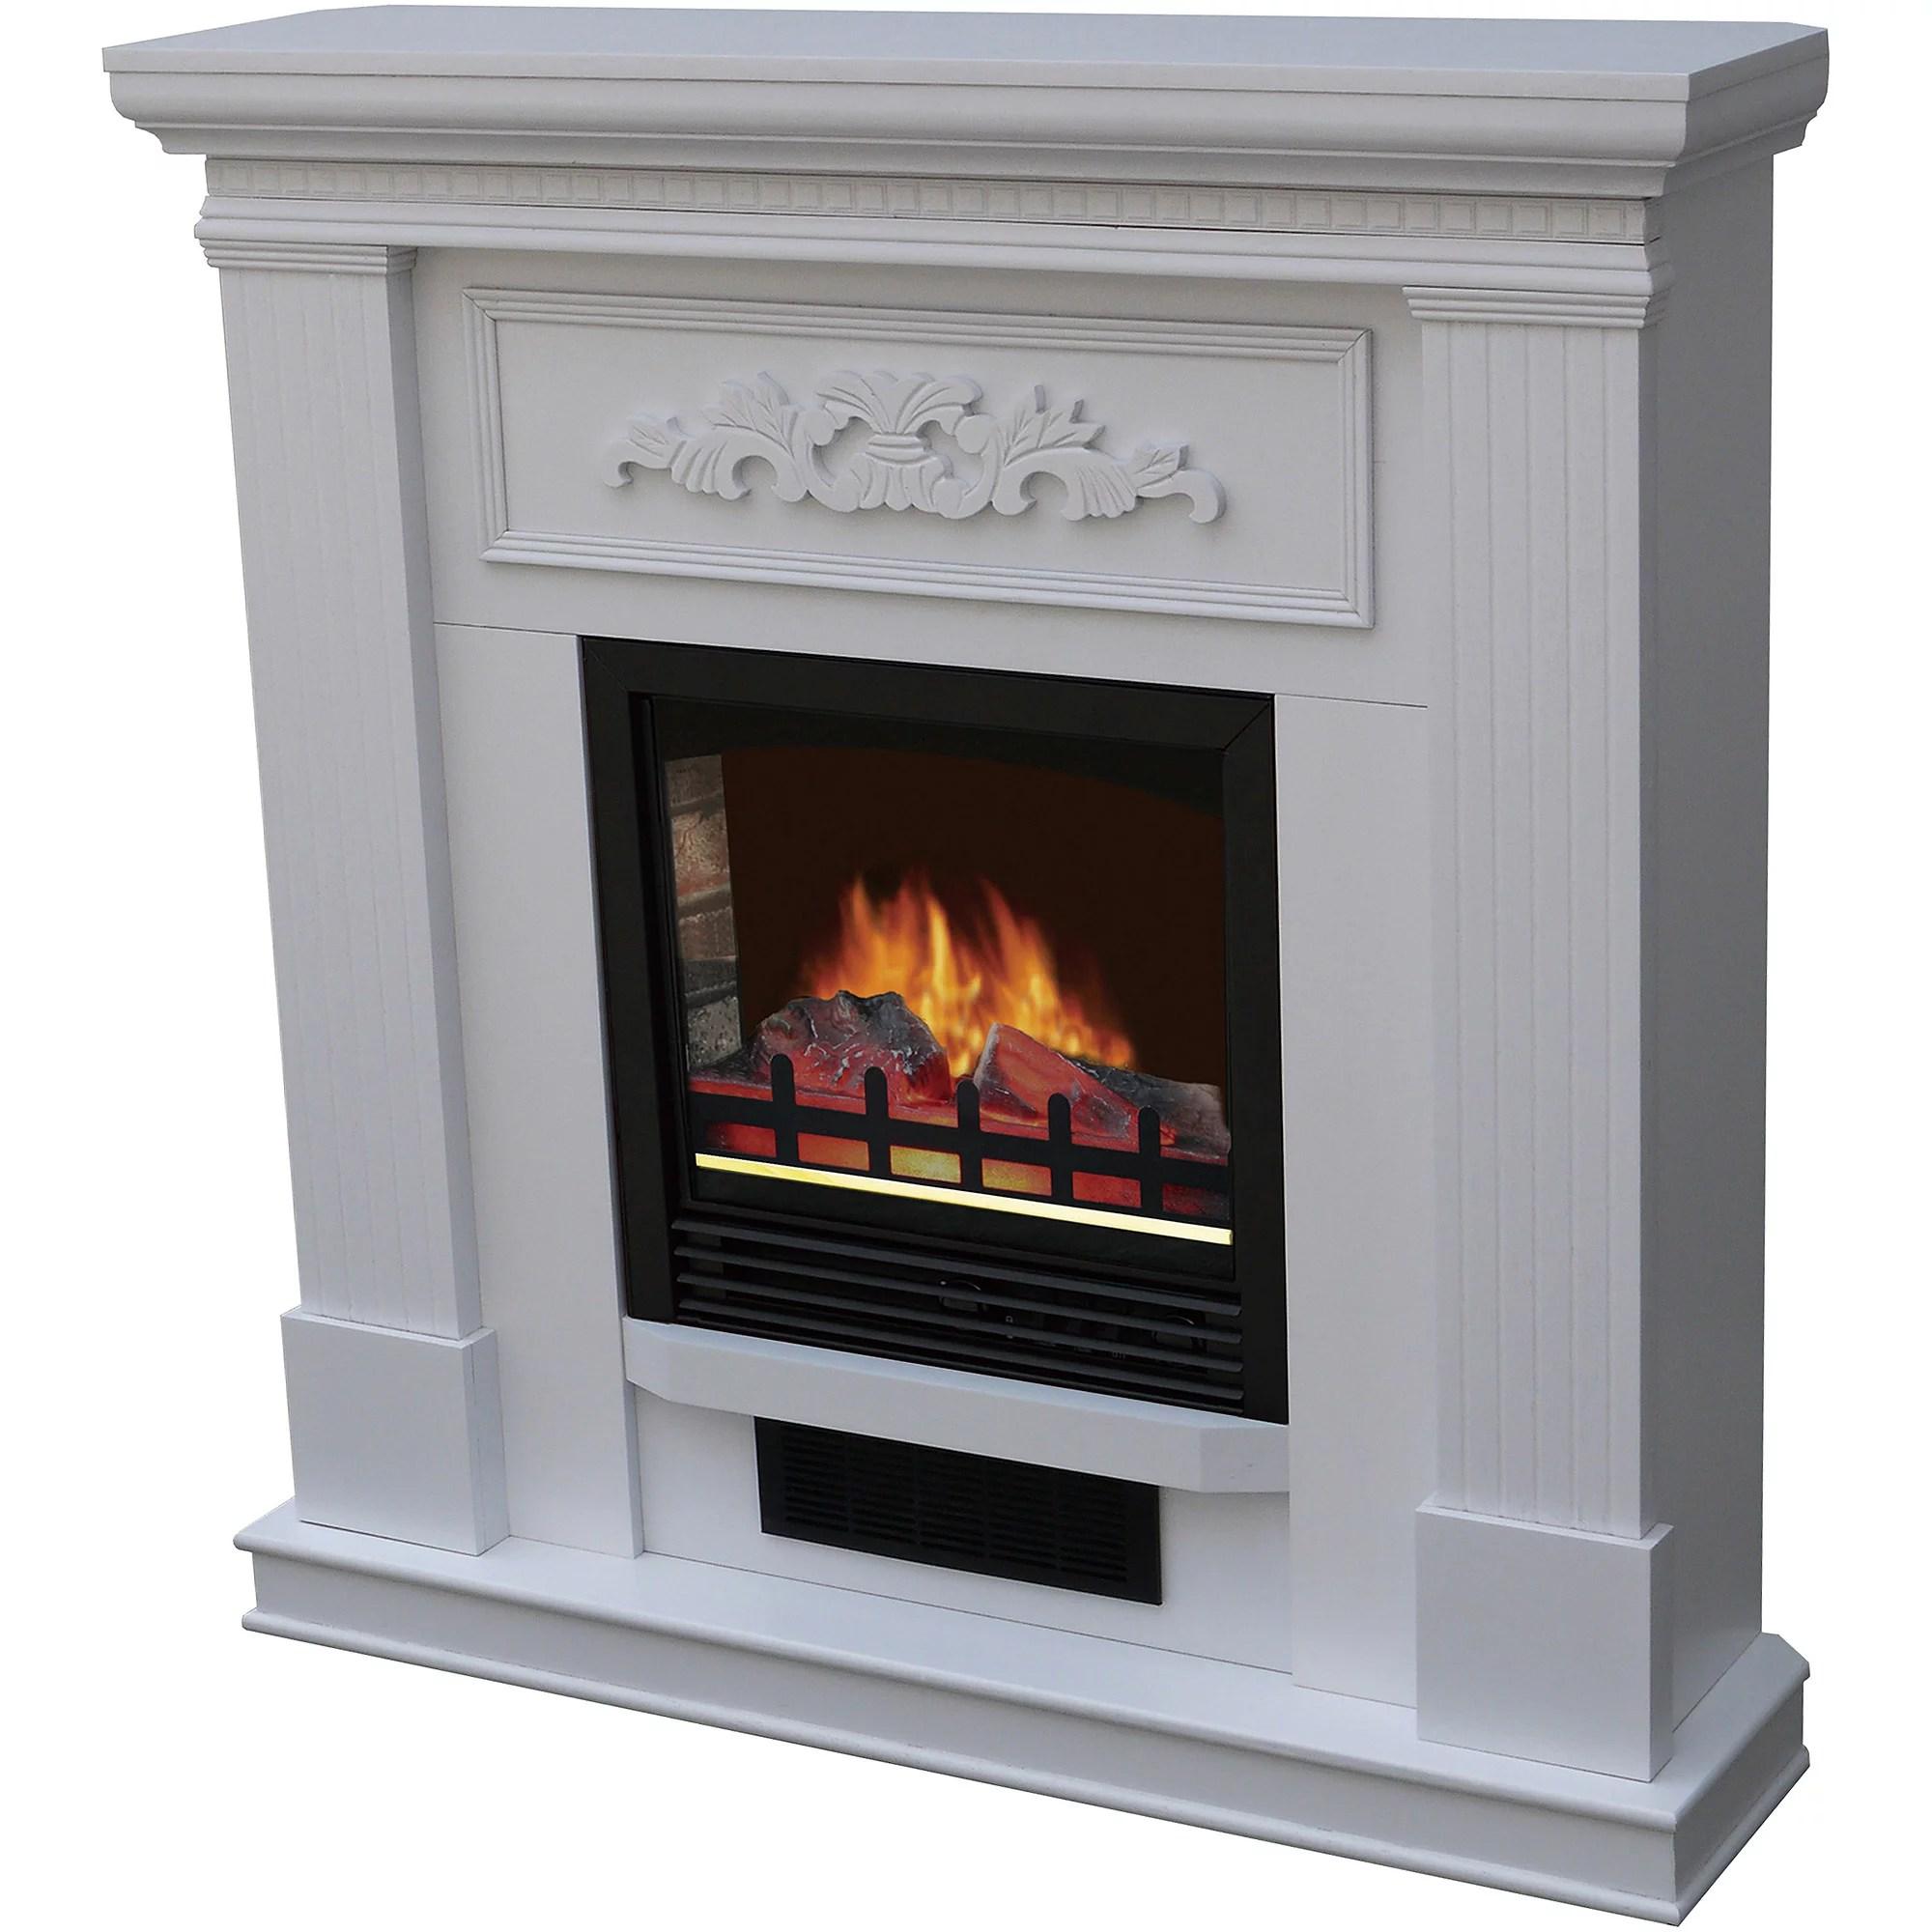 Decor Flame 35 Wall Mounted Fireplace